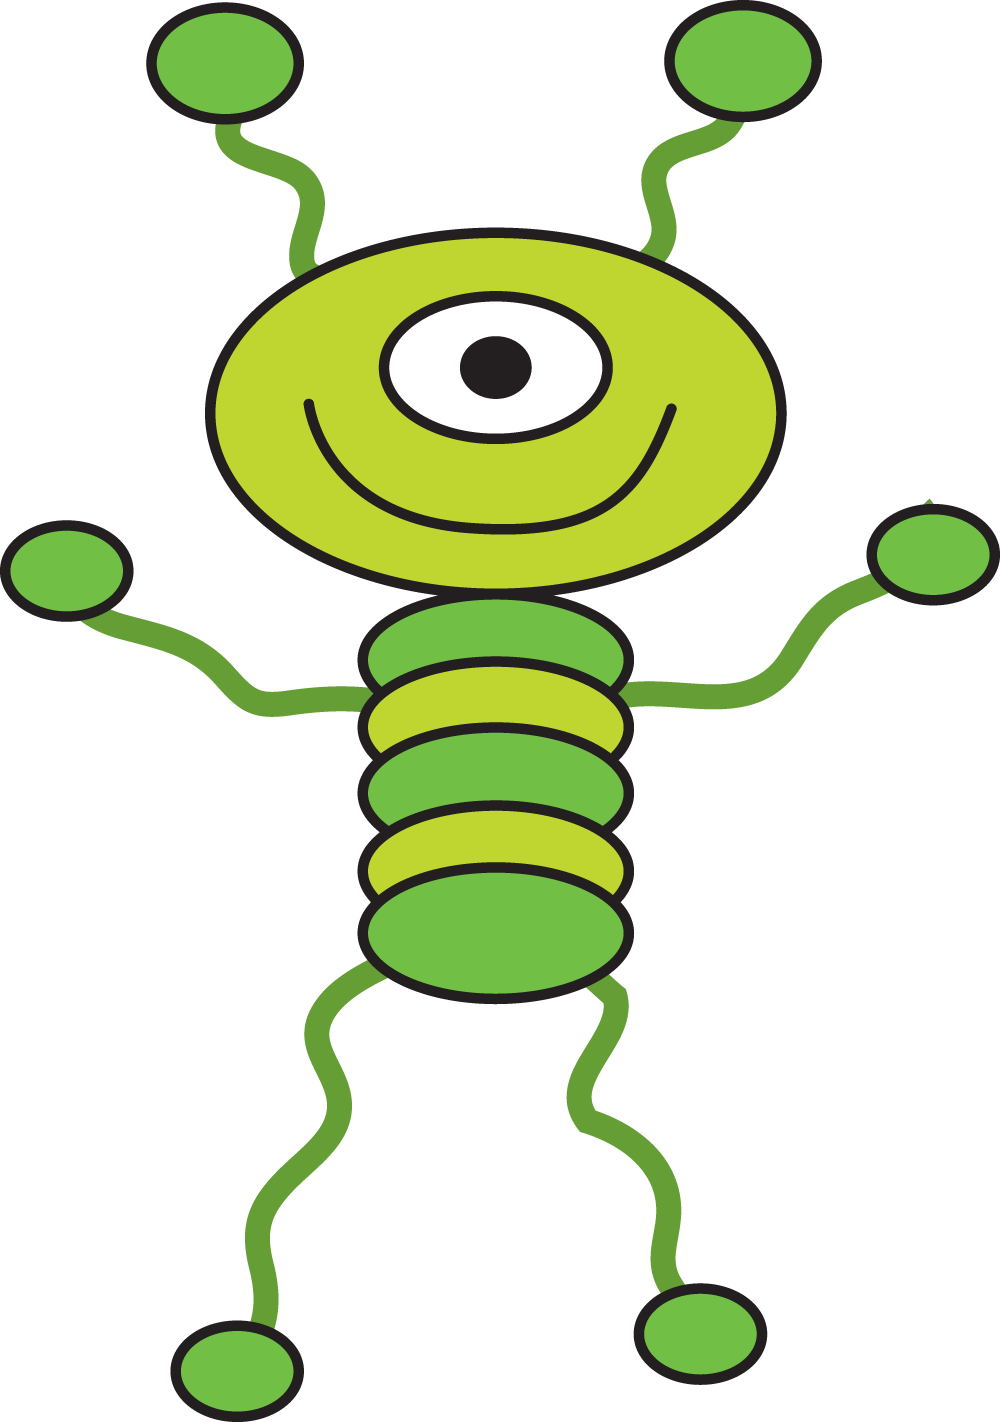 Alien Clipart.